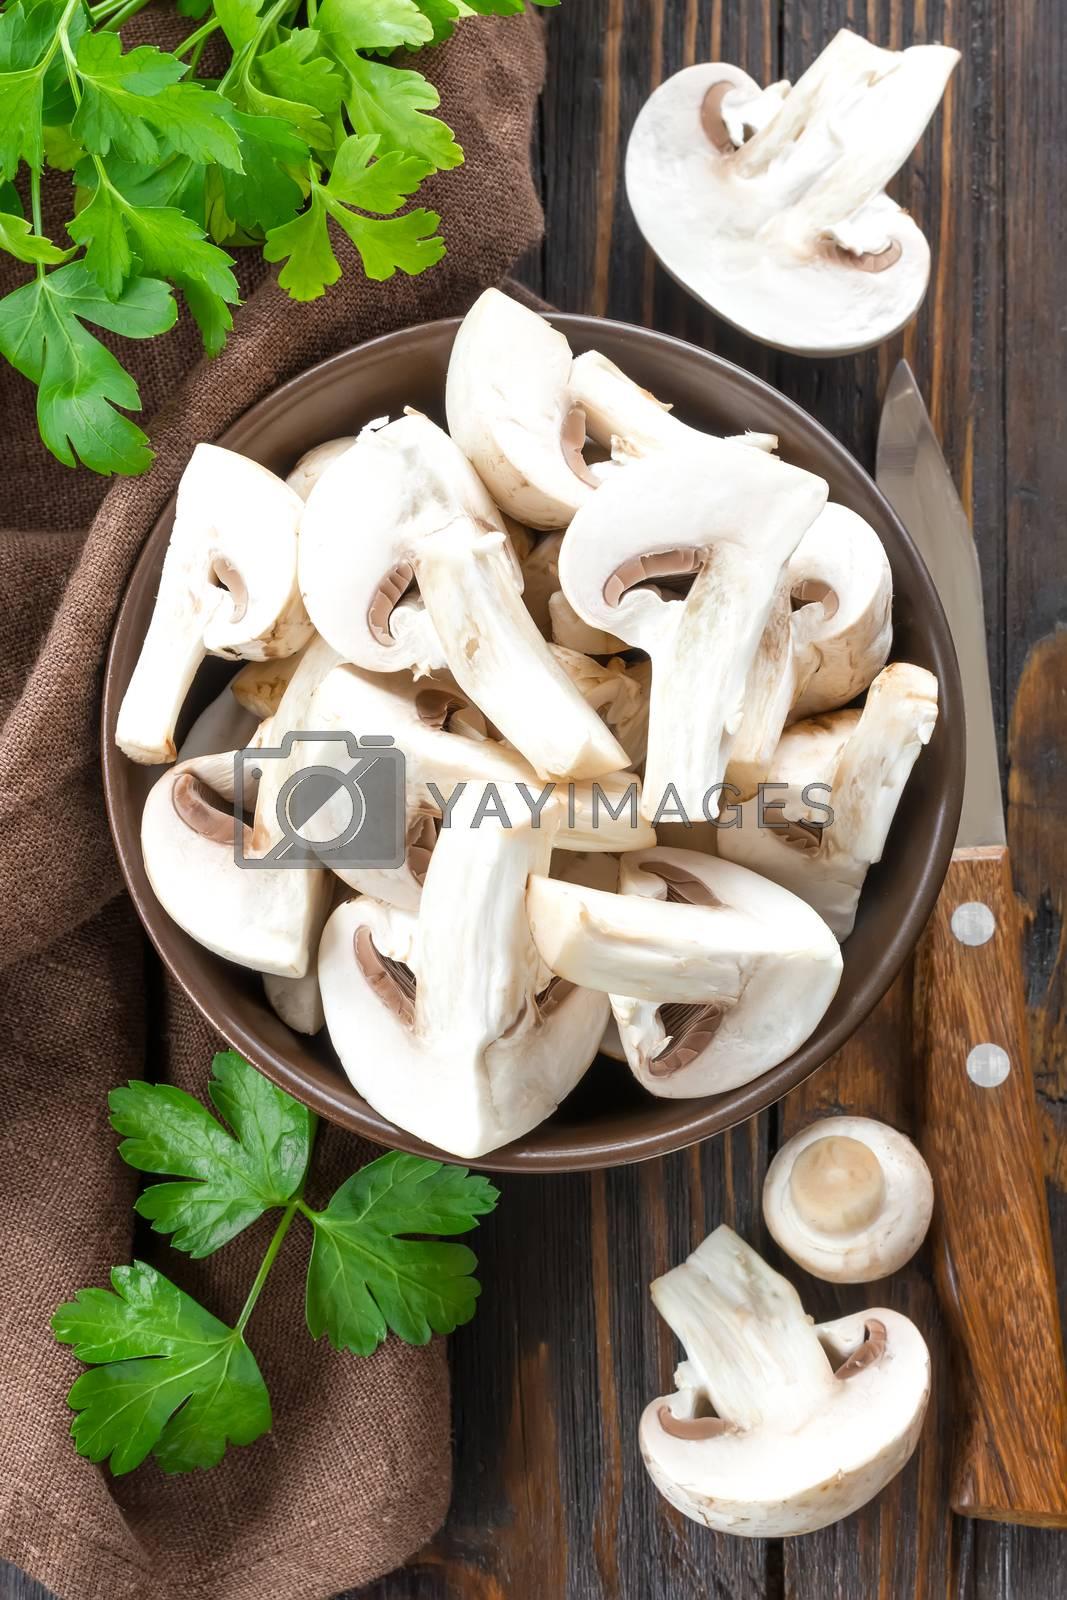 Royalty free image of Raw mushrooms by yelenayemchuk